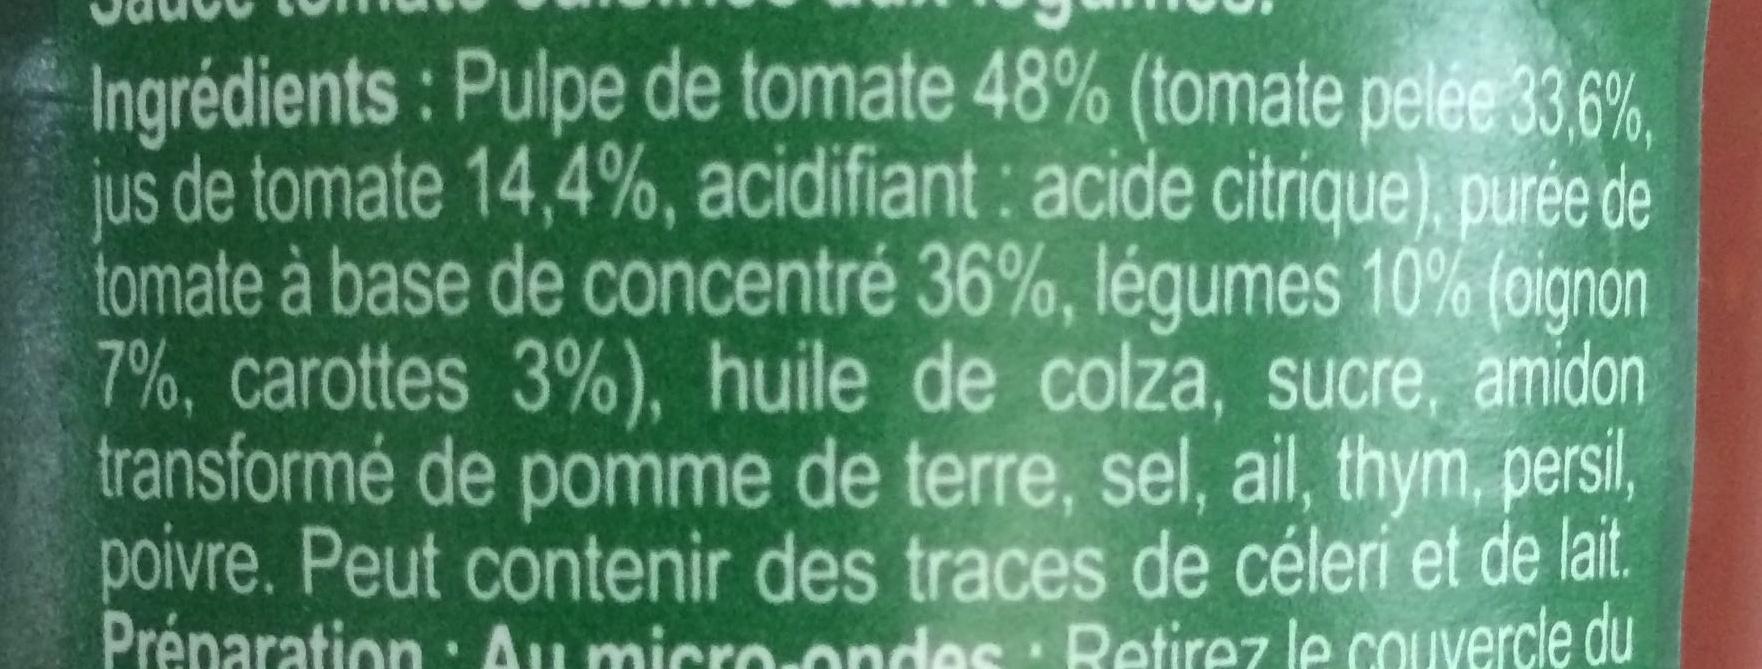 Napolitaine - Ingredients - fr